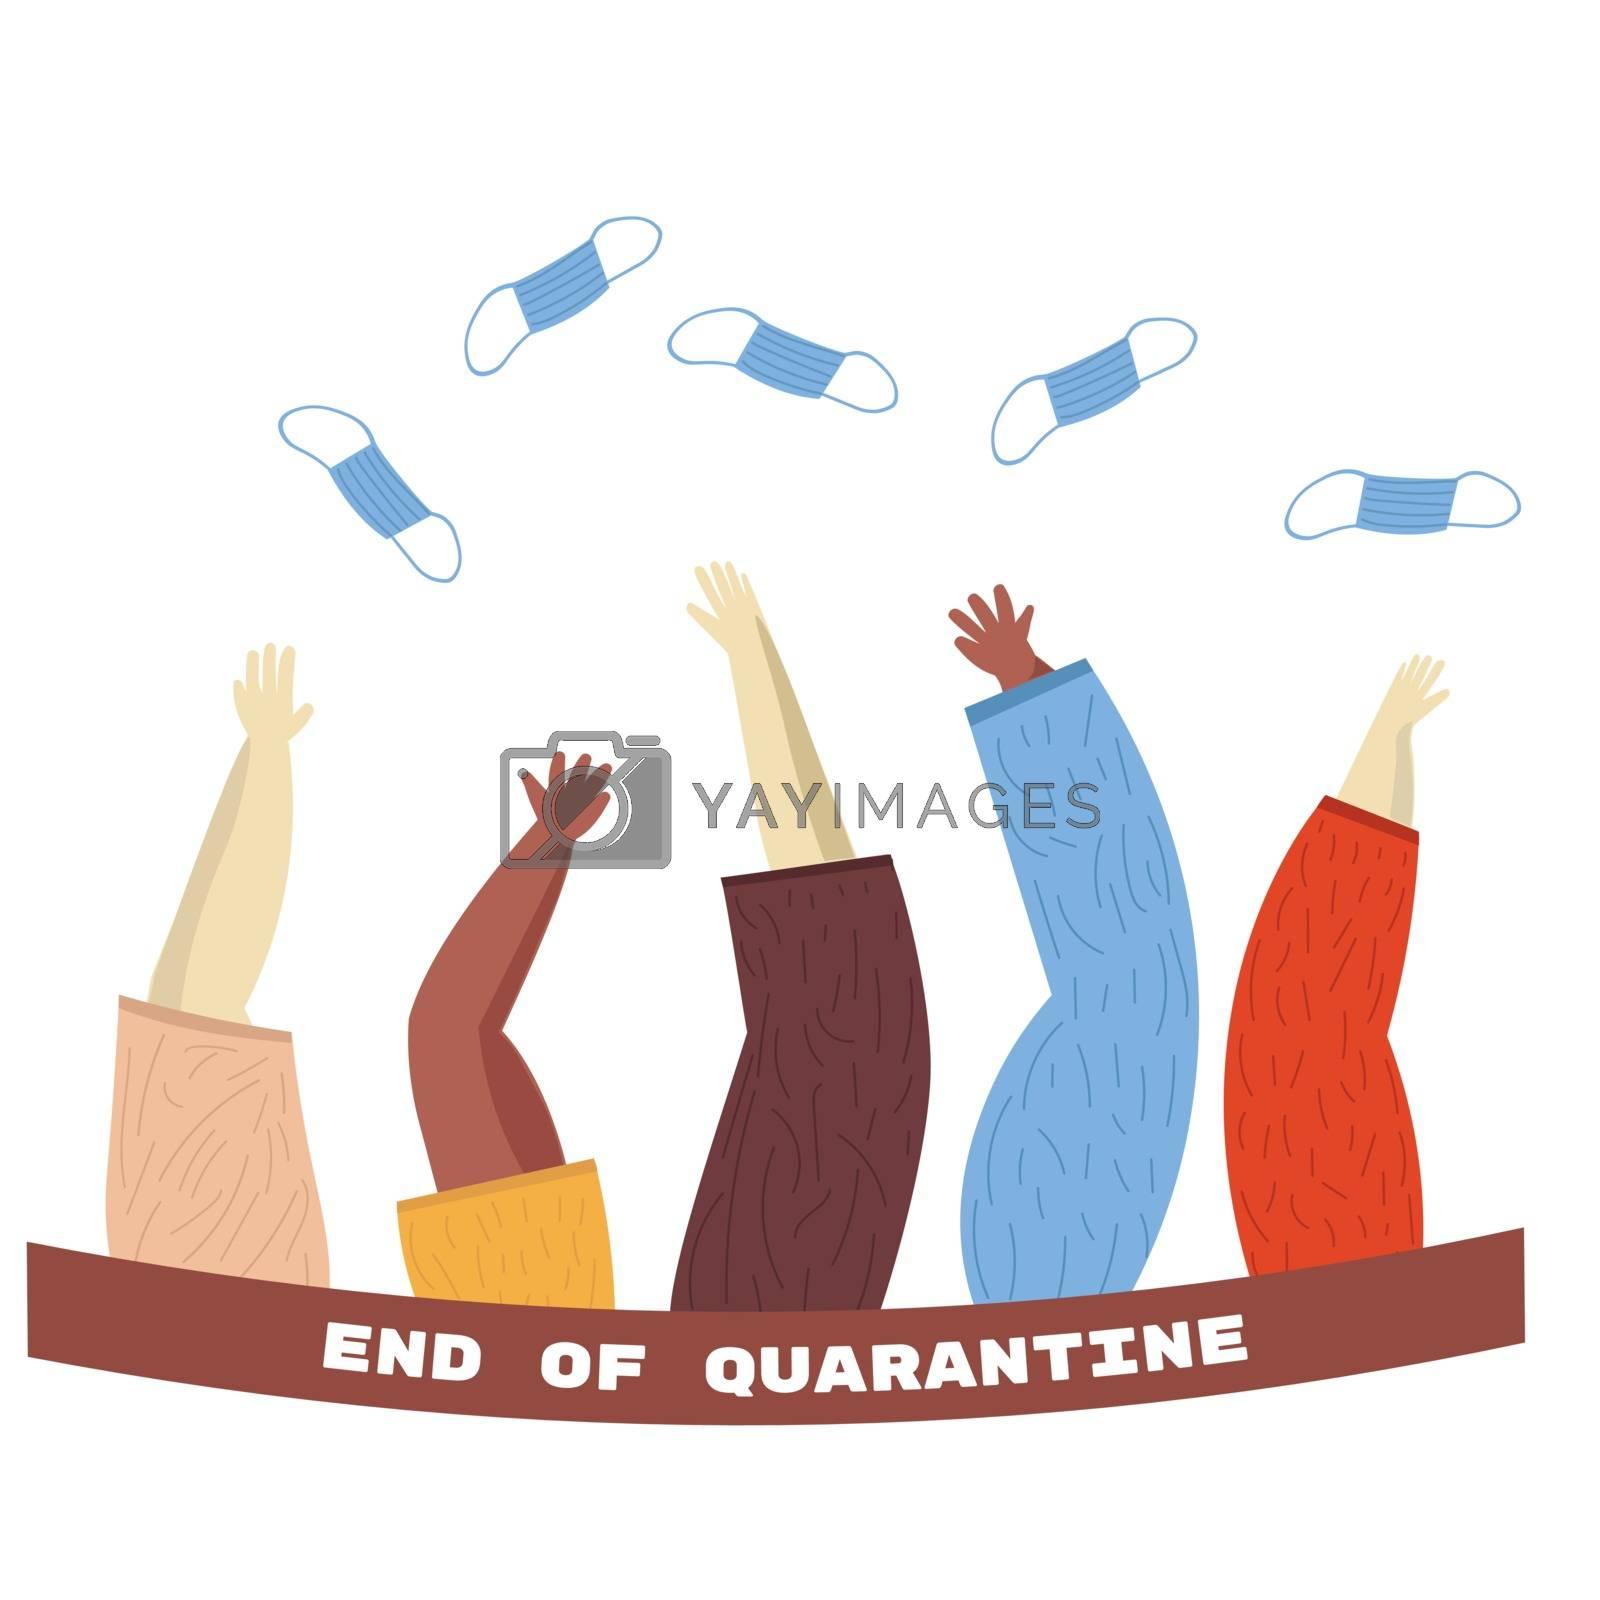 Coronavirus victory concept. Hands throw up medical masks. Hand drawn illustration End of quarantine. Raised hands up